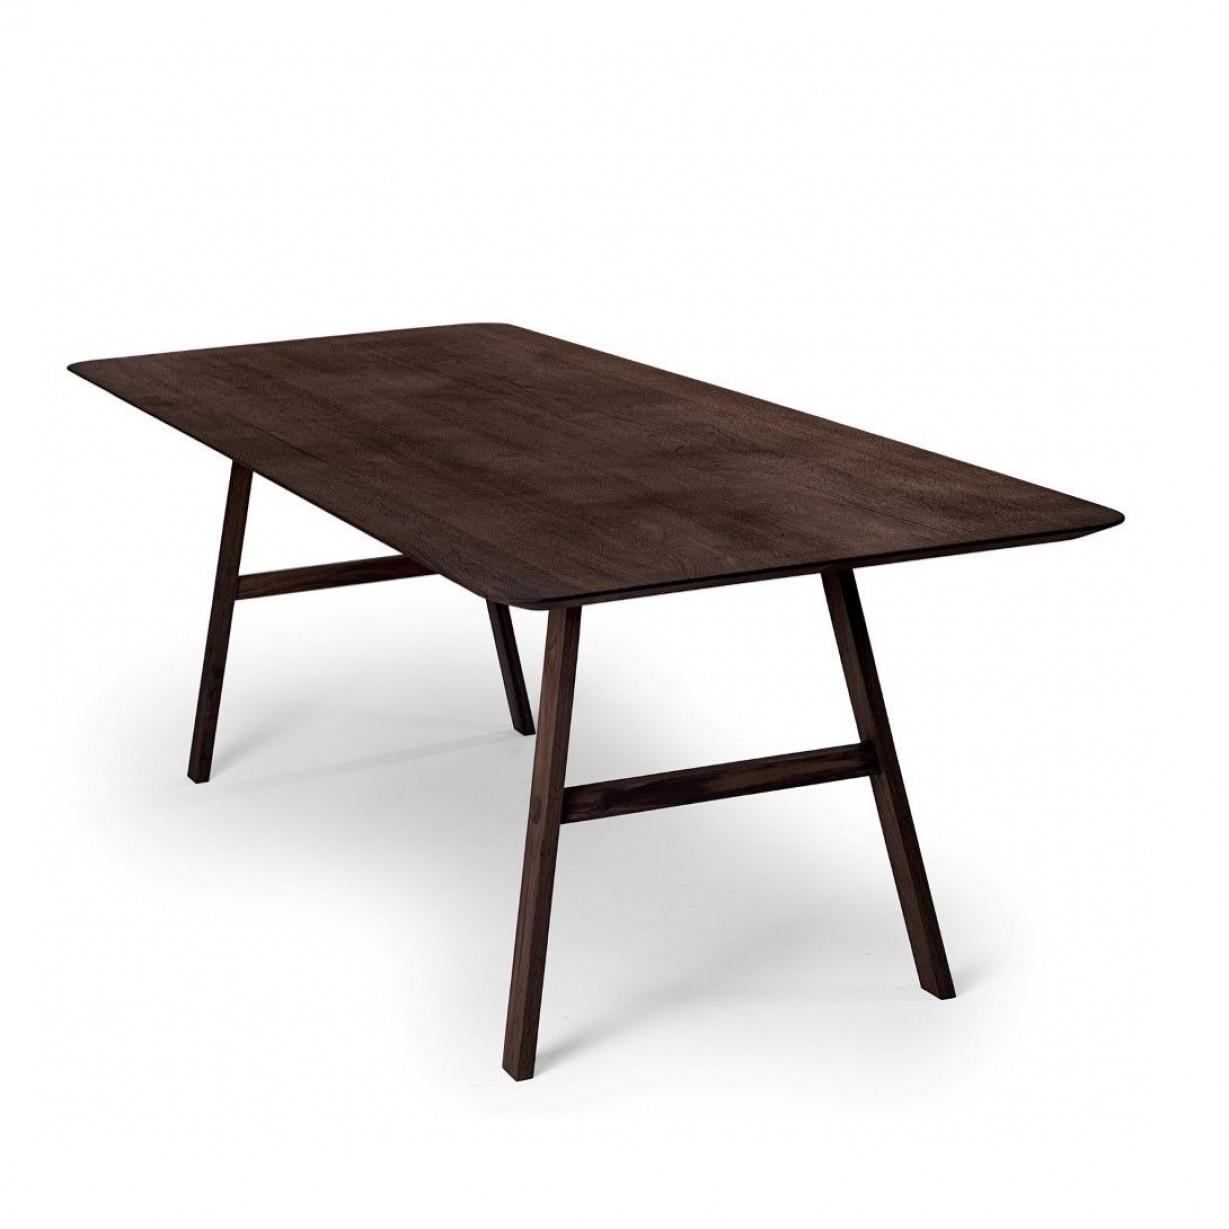 MALIN Dining Table | Walnut